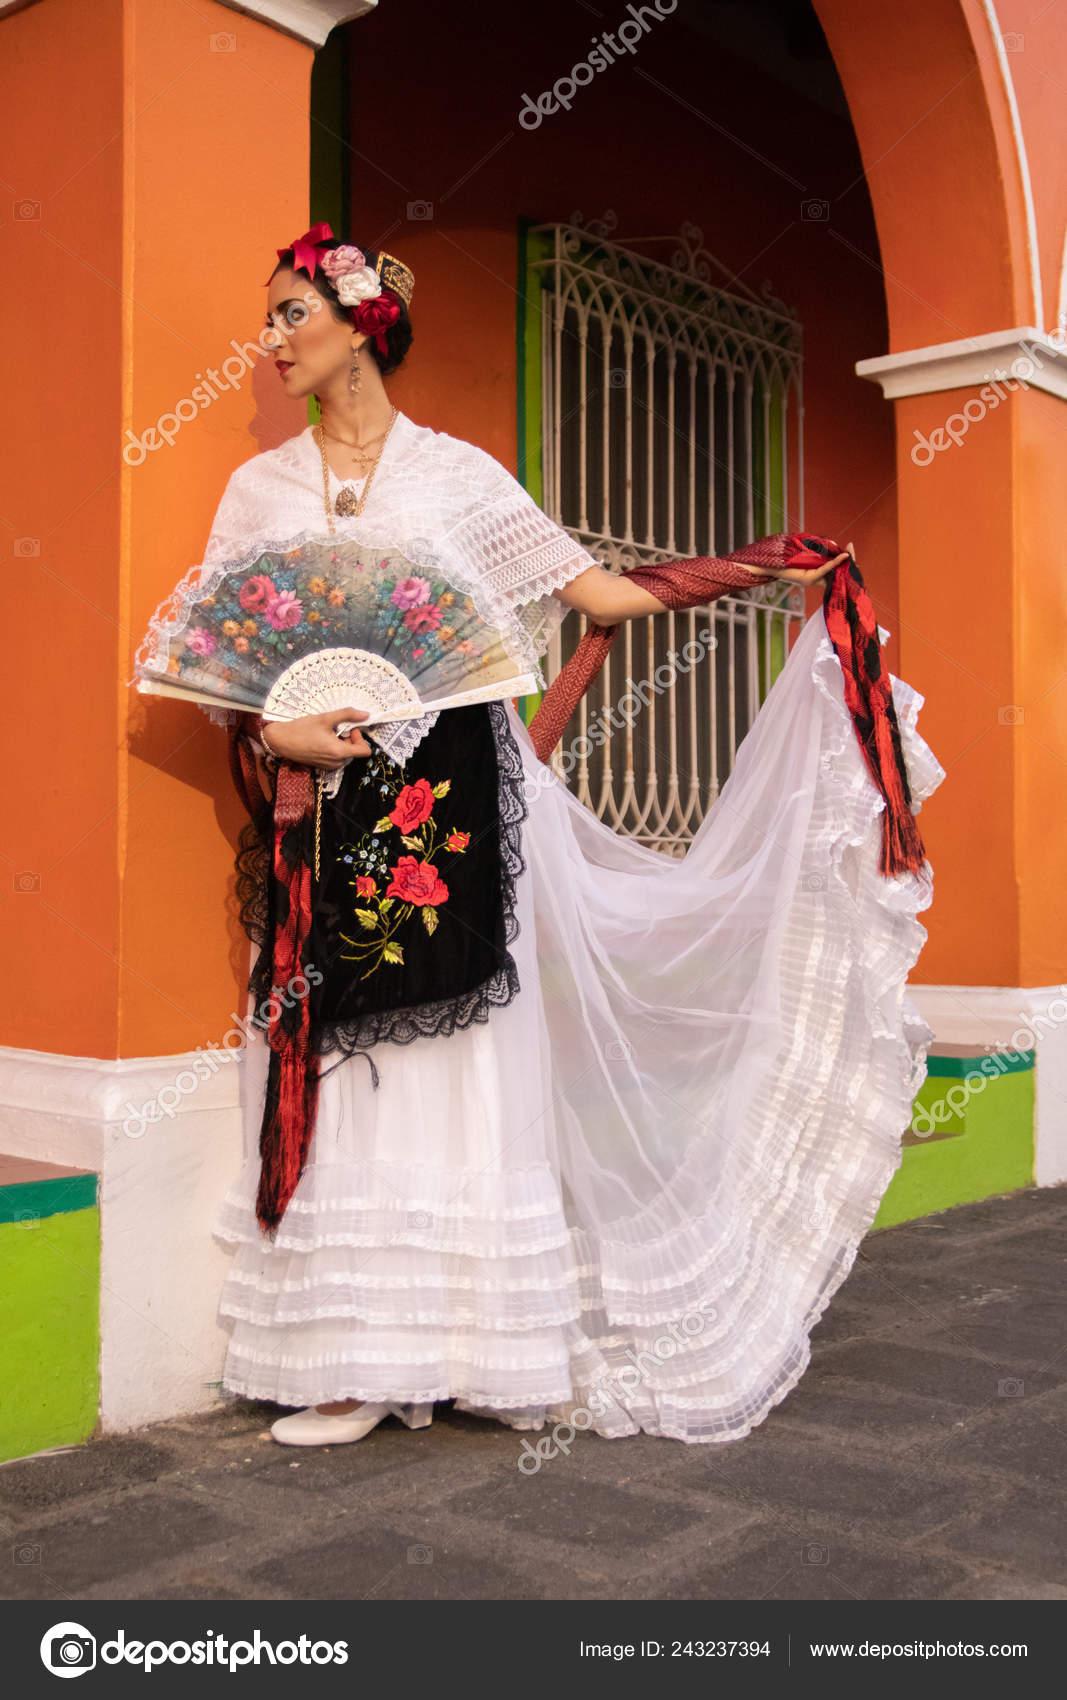 Vestido Distintivo Típico Veracruz Zona Sur México Fotos